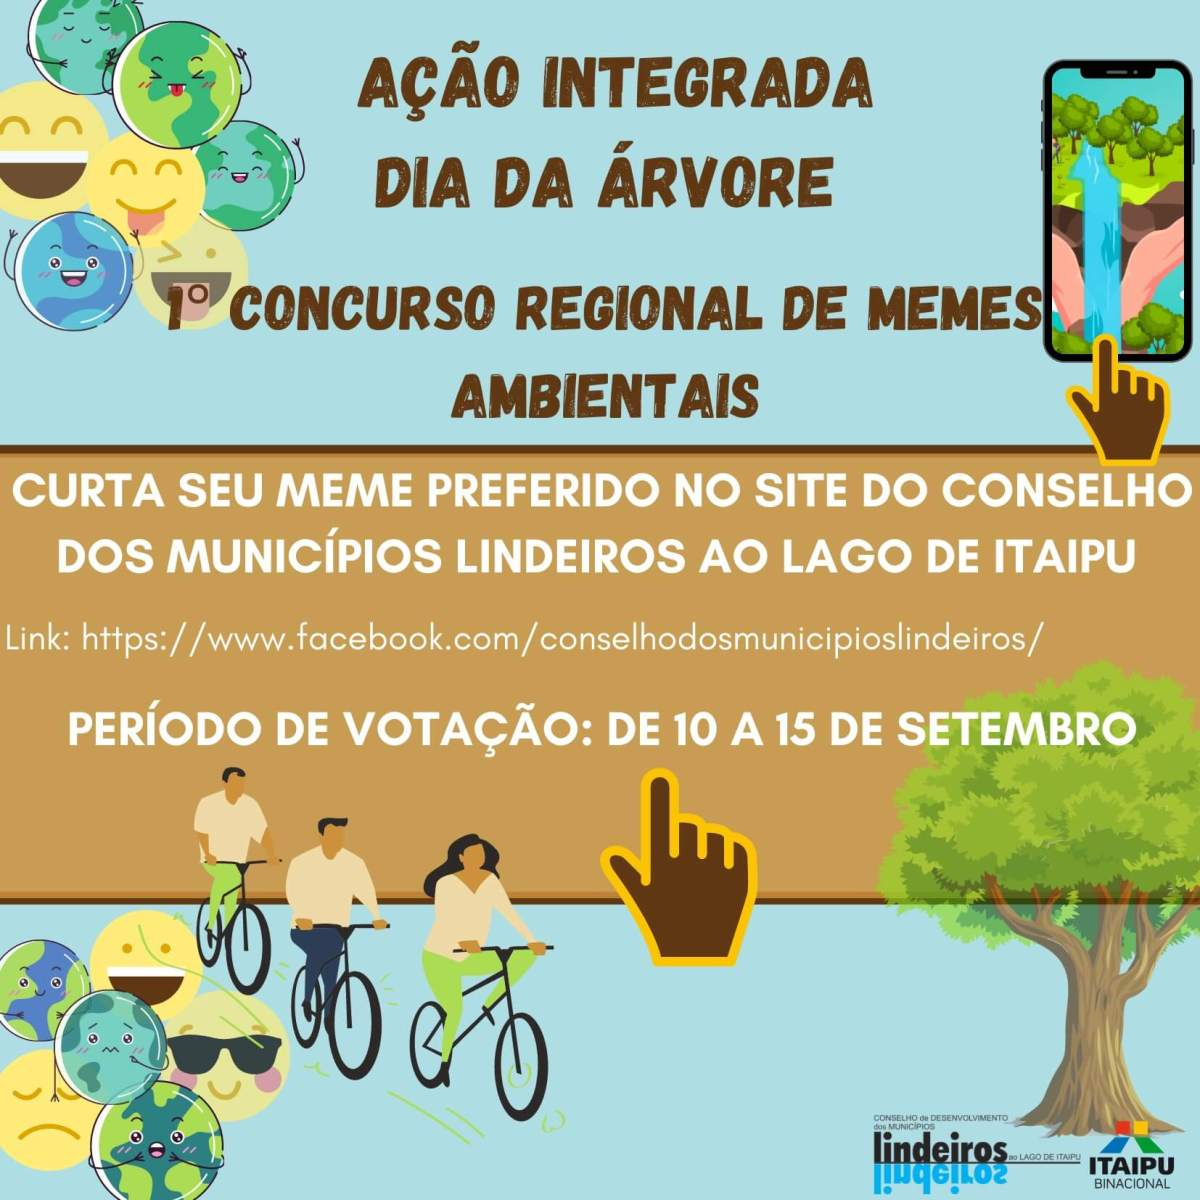 Meme-Ambiental-2020-itaipu-foz